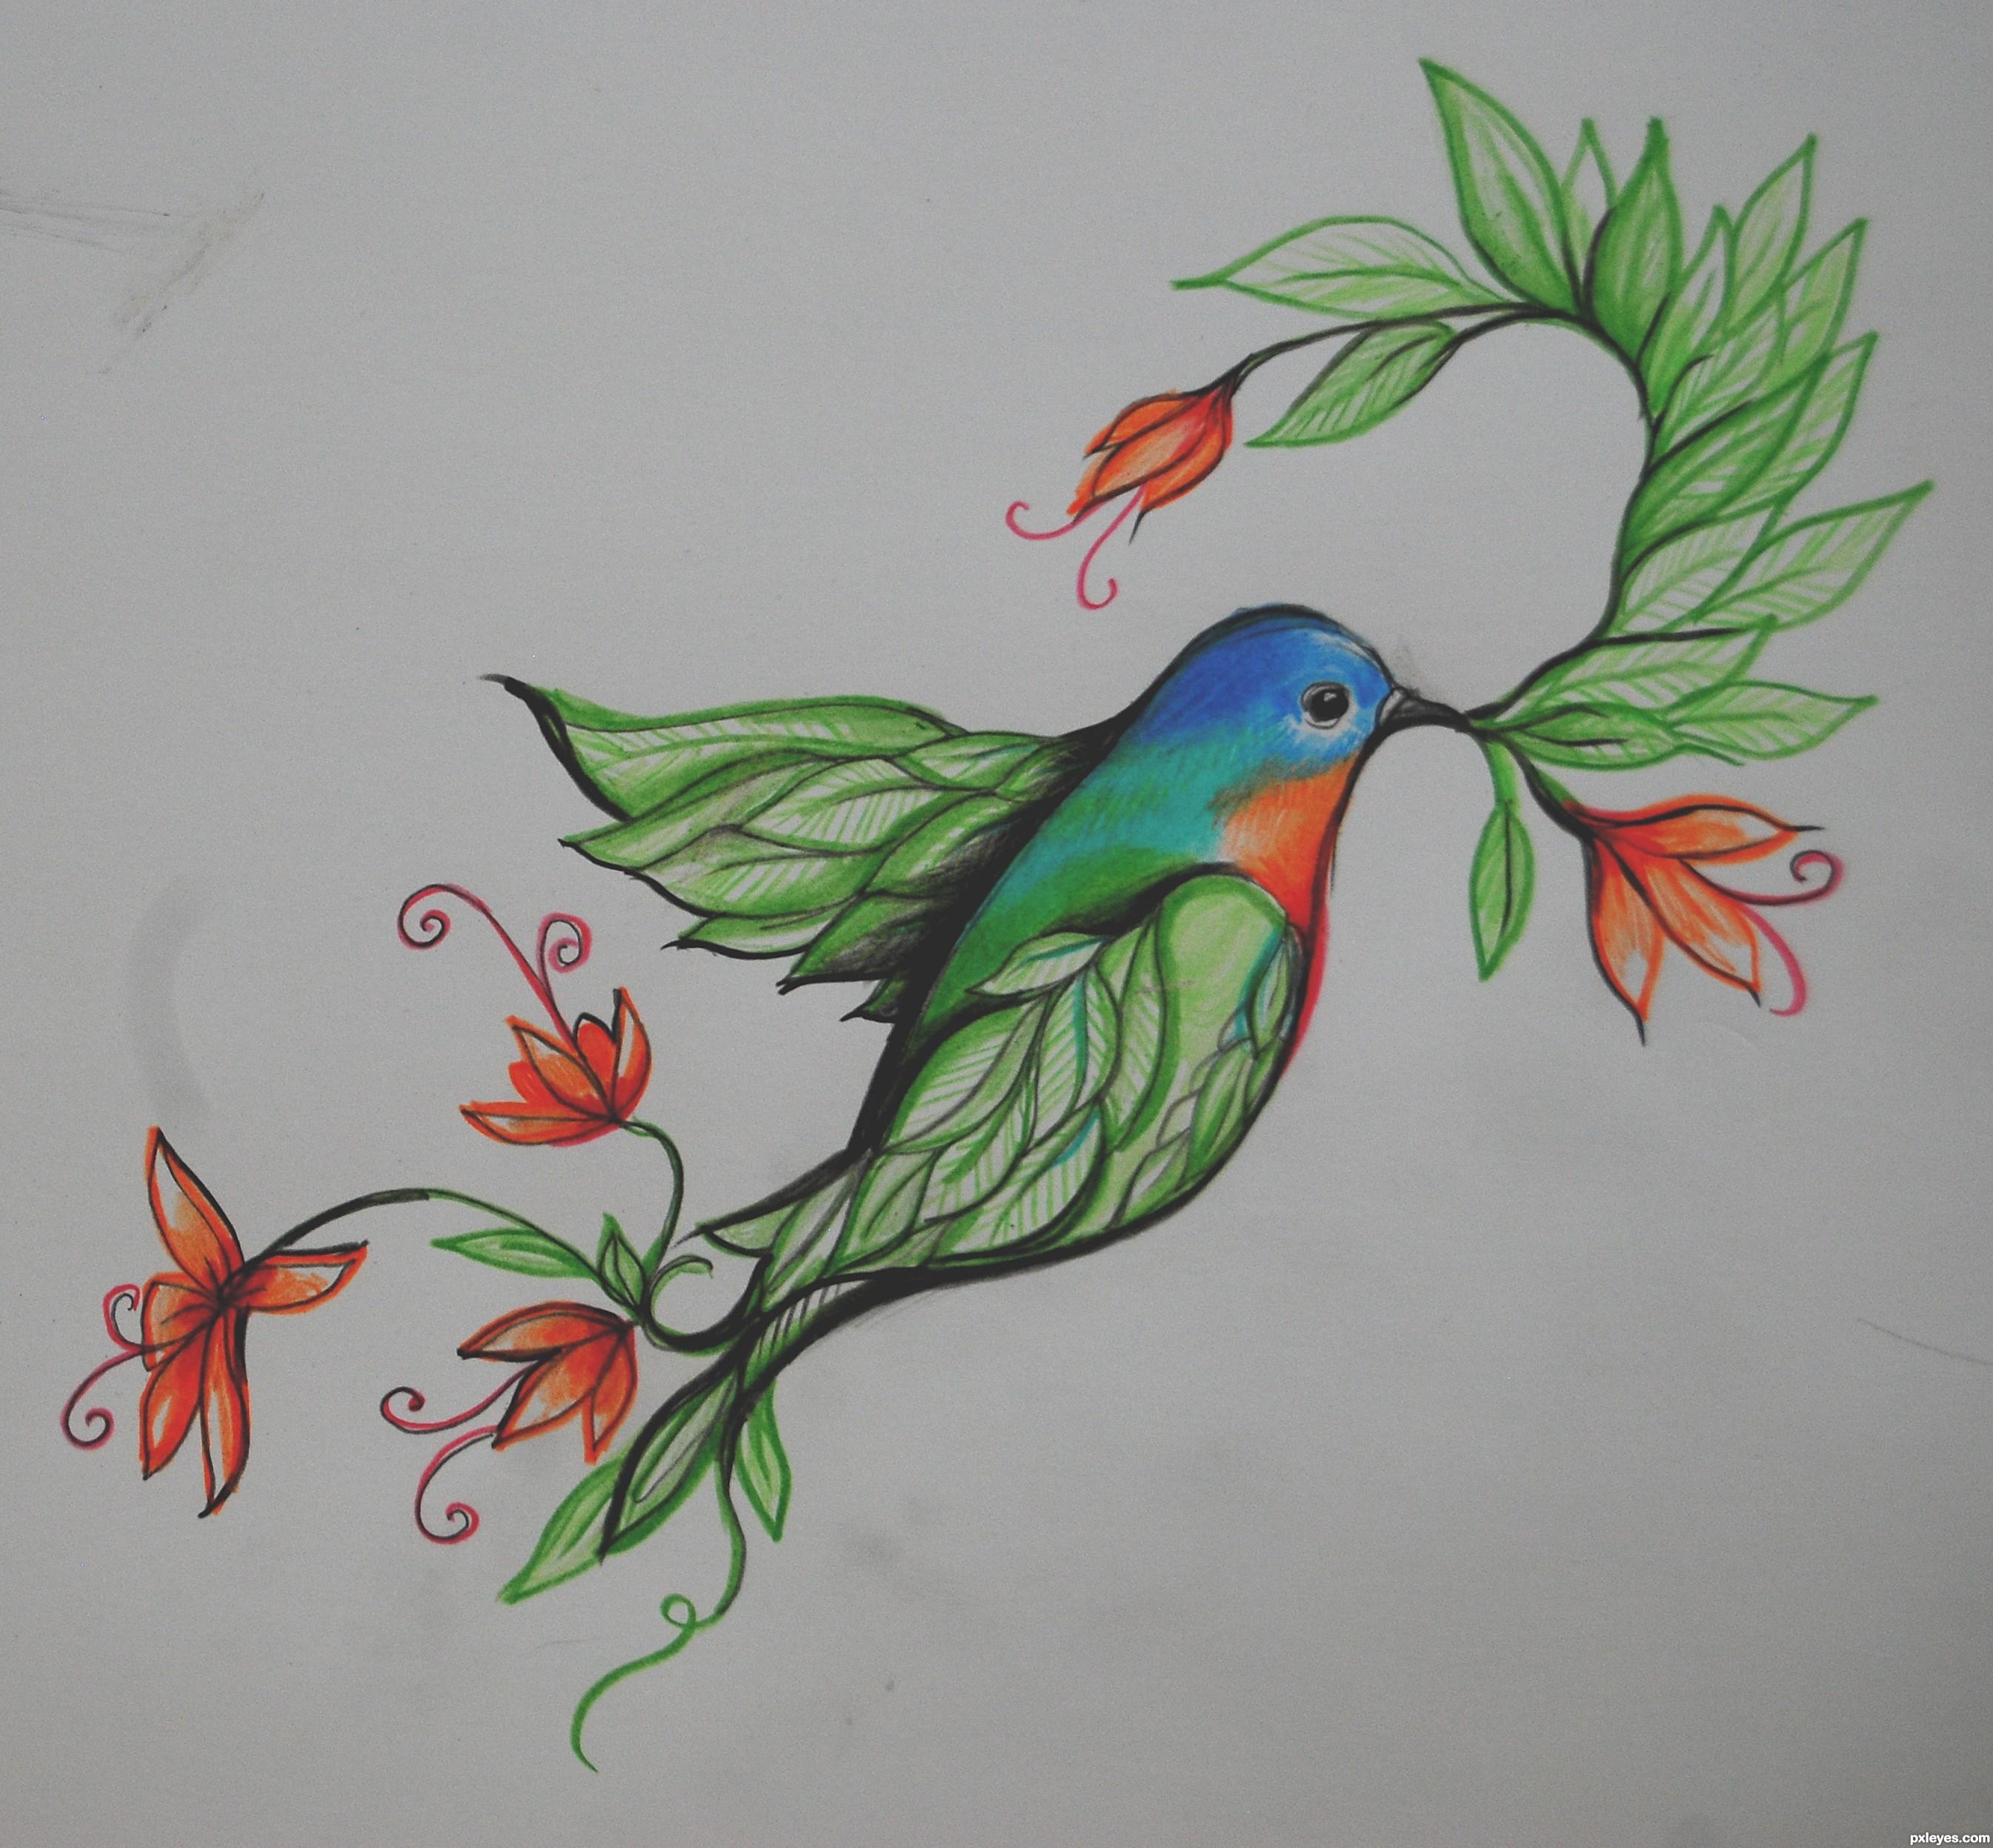 Drawn brds paradise Photo#7 And drawing Bird Drawing